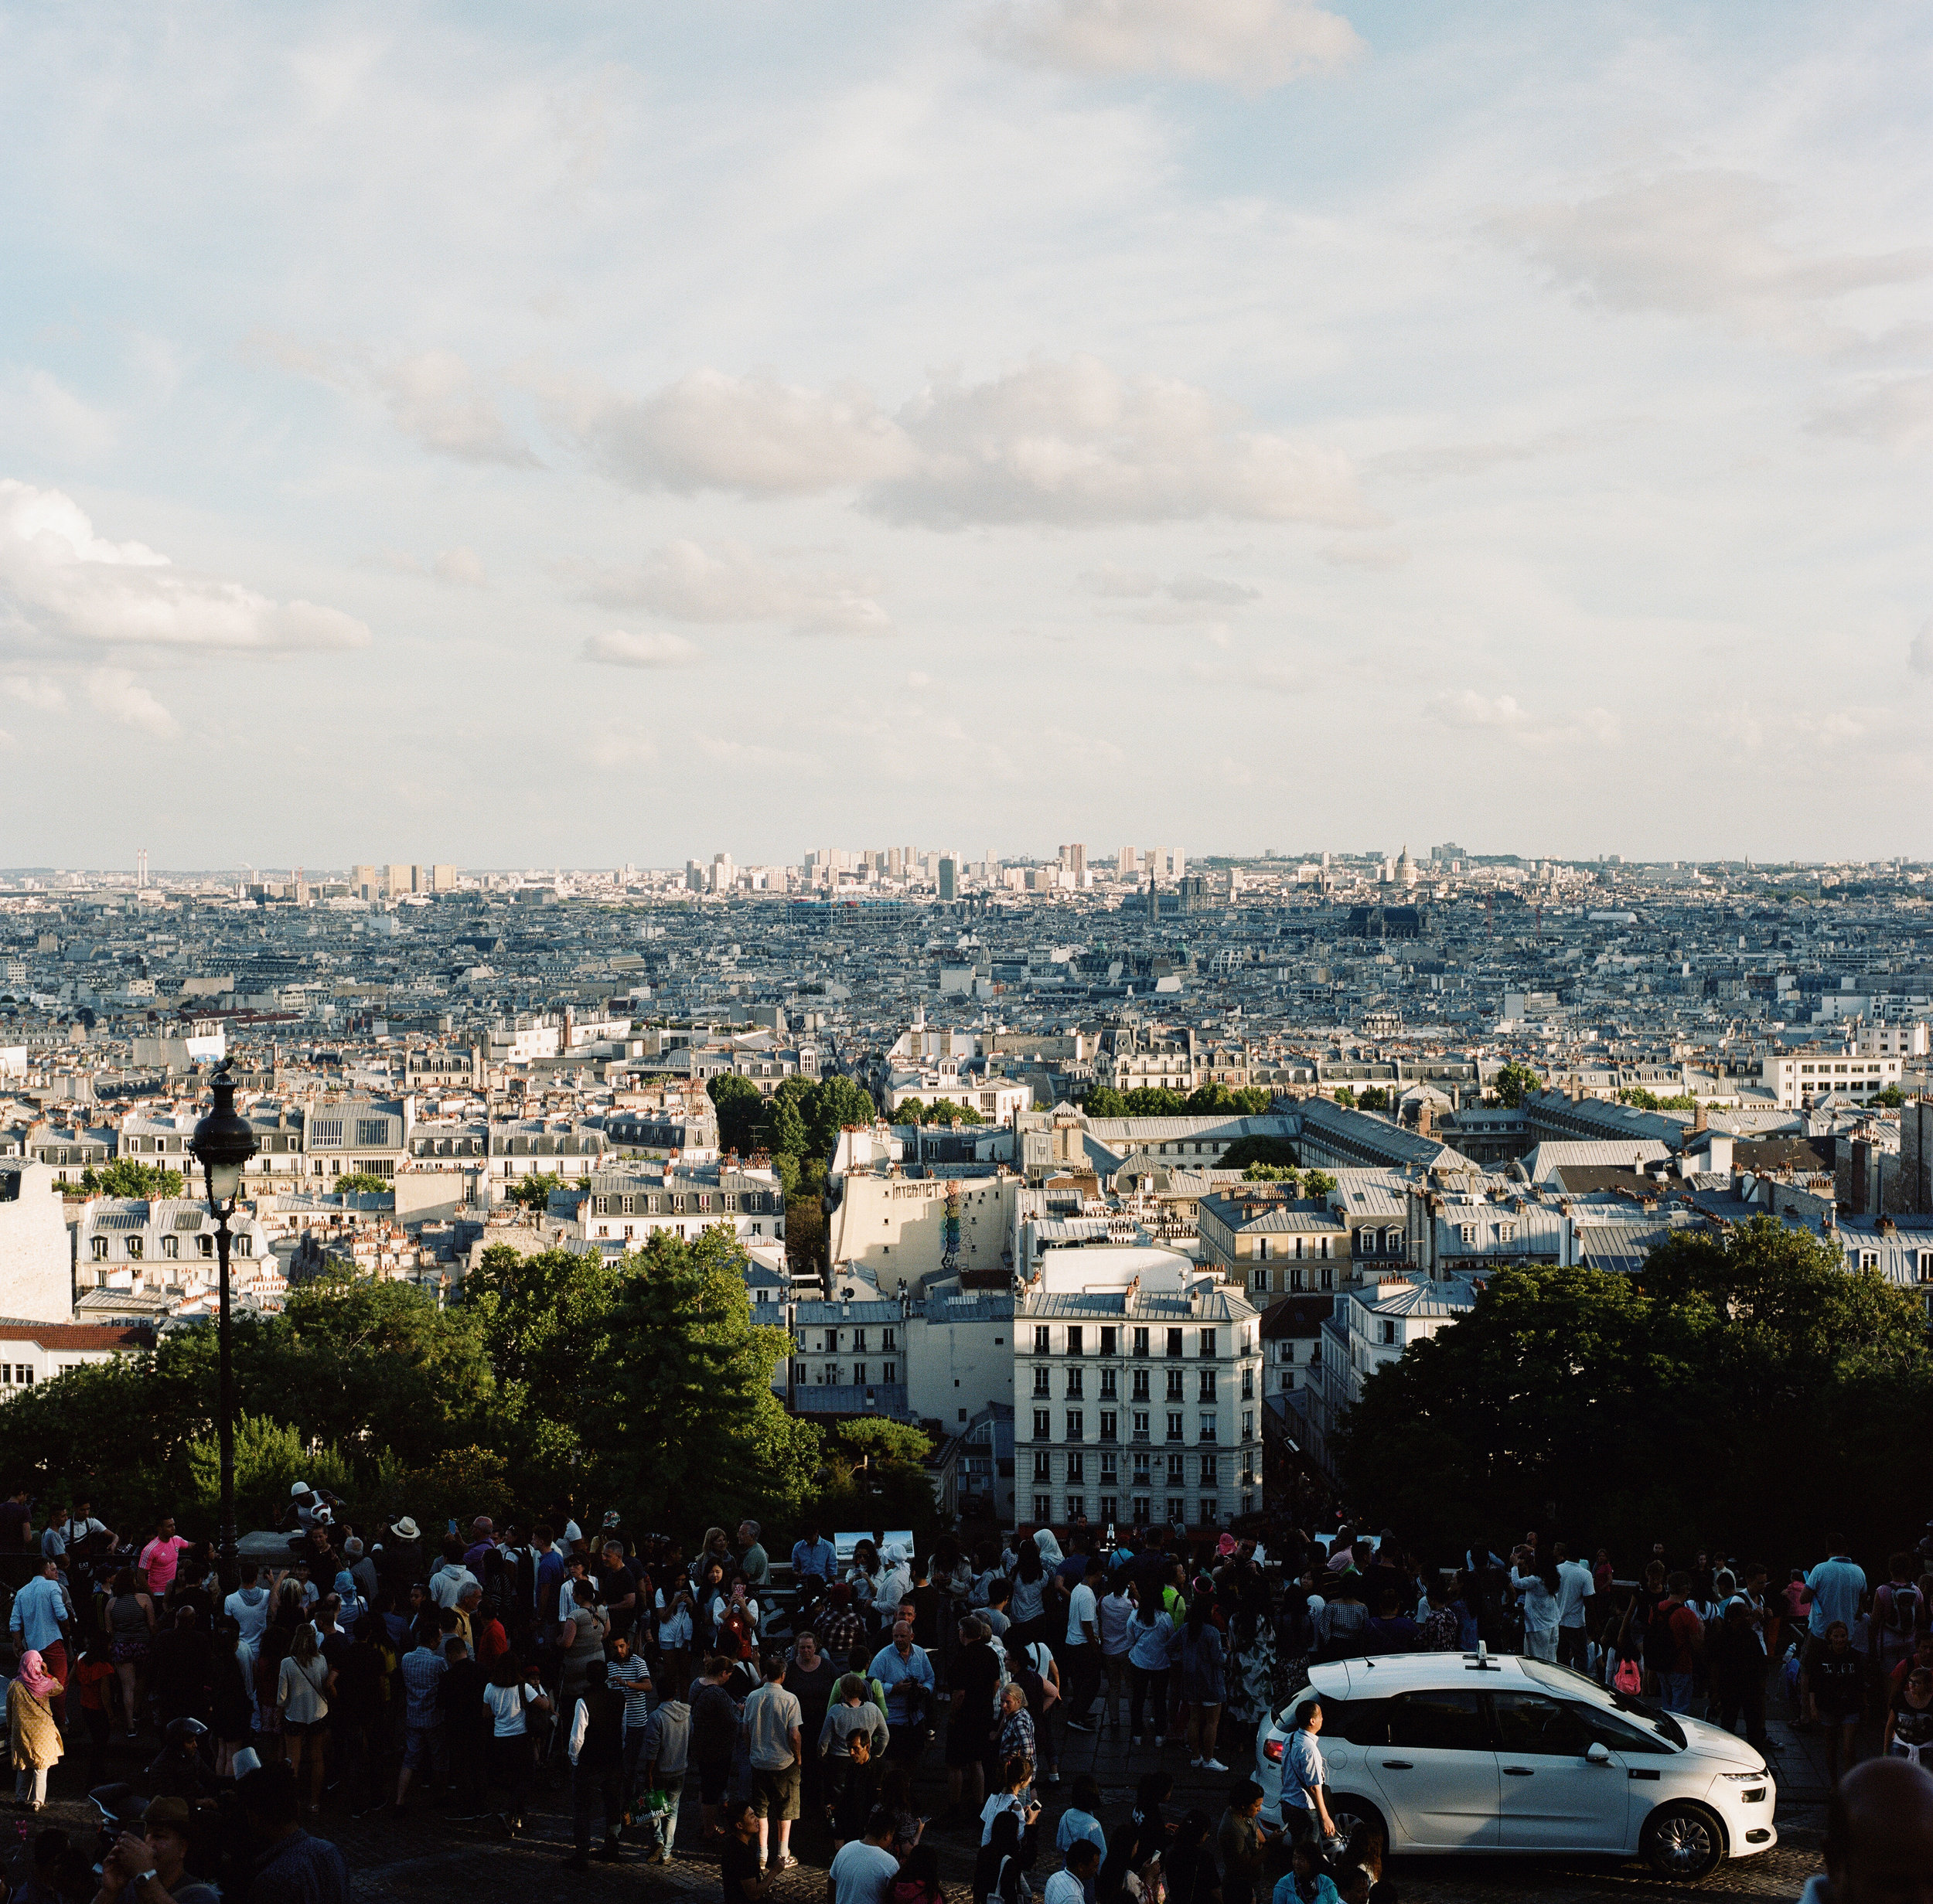 ParisFilm_2017_AdamDillon_000096250006.jpg